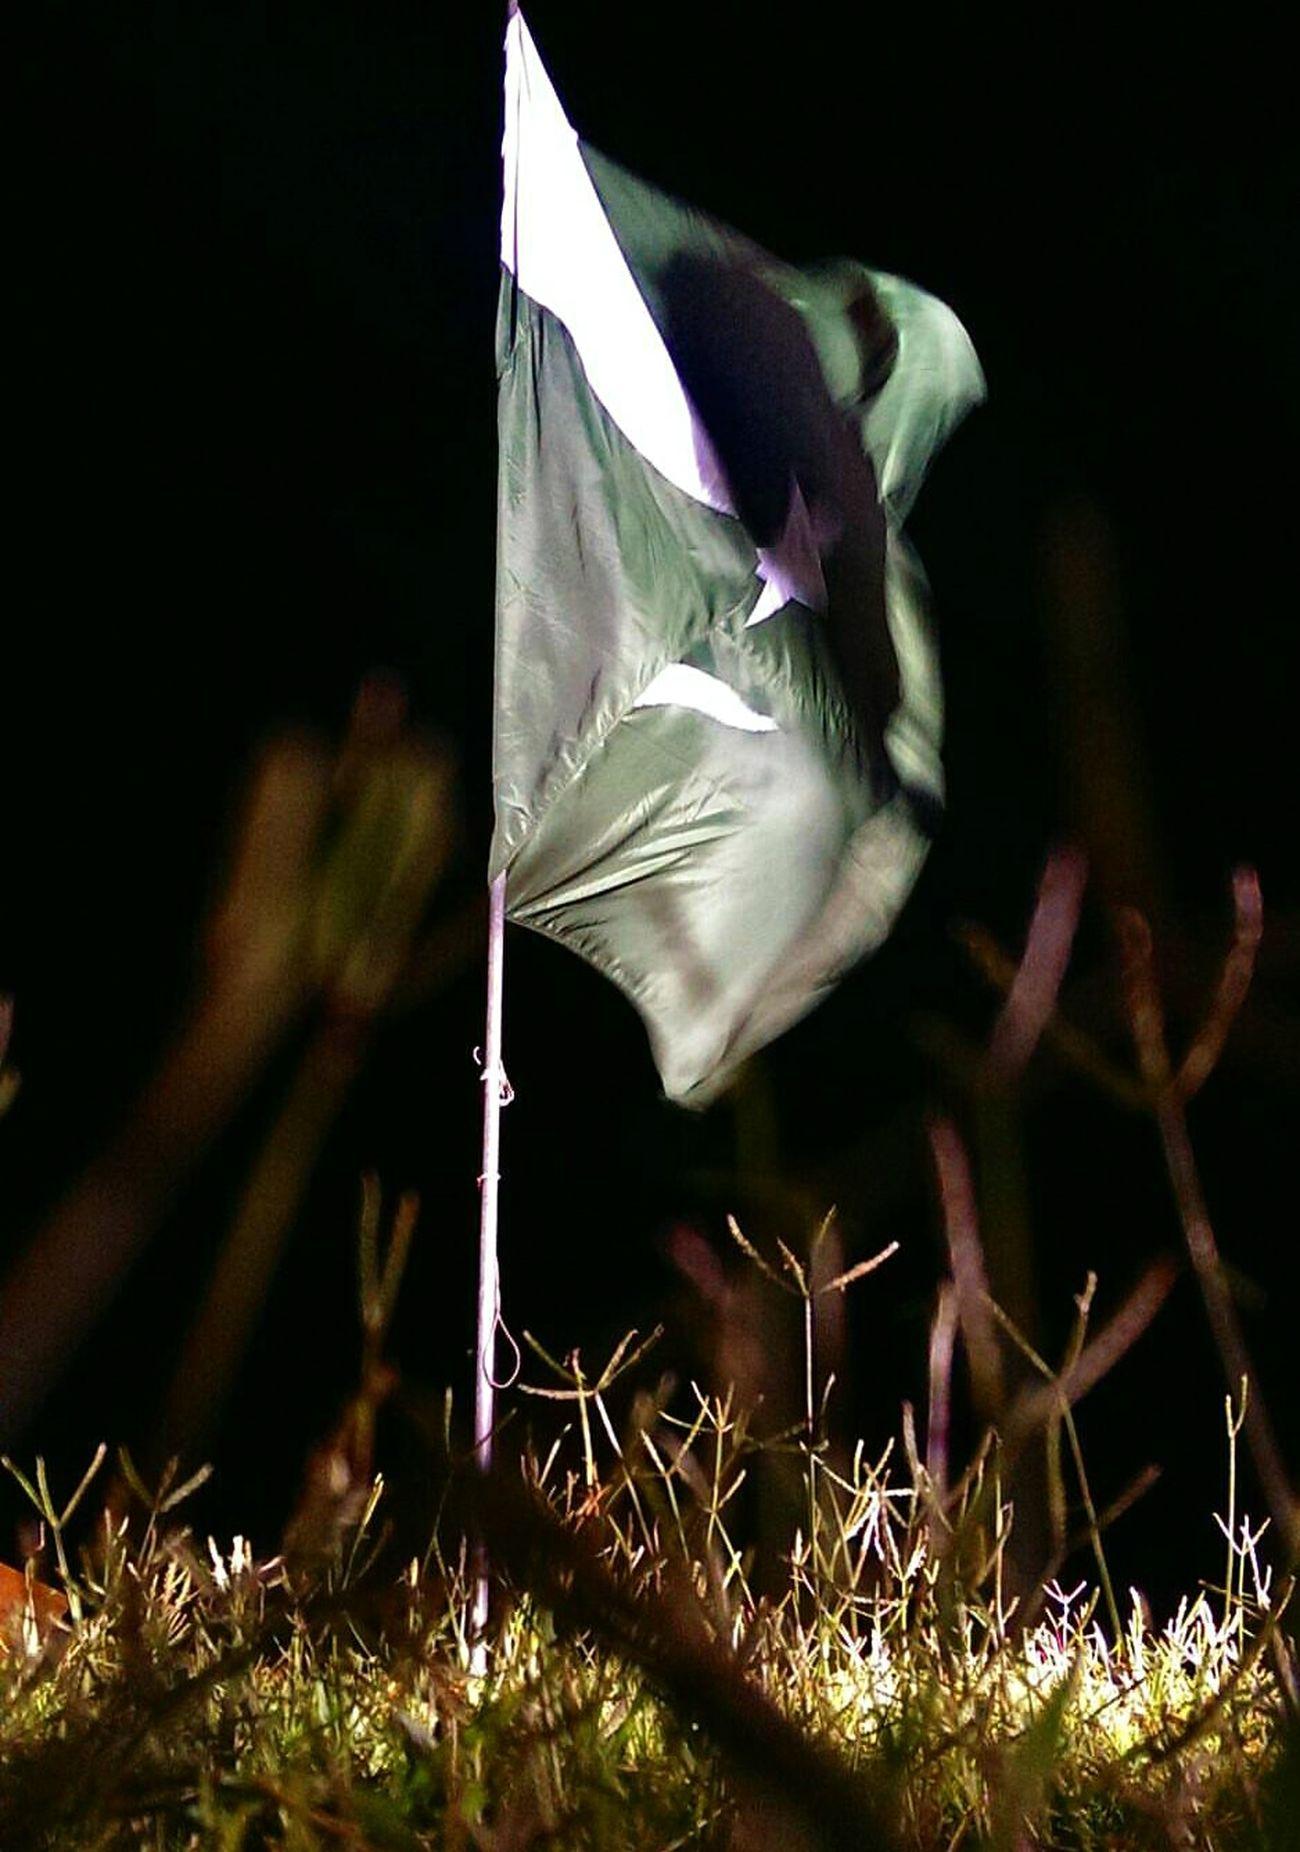 Nationalflag Pakistan Pakistani Pakistandiaries Pakistan Zindabad <3 Respect Honour Peace Peaceful Night Nightphotography Night Shot Nationaldaycelebrations Grass No People Nature